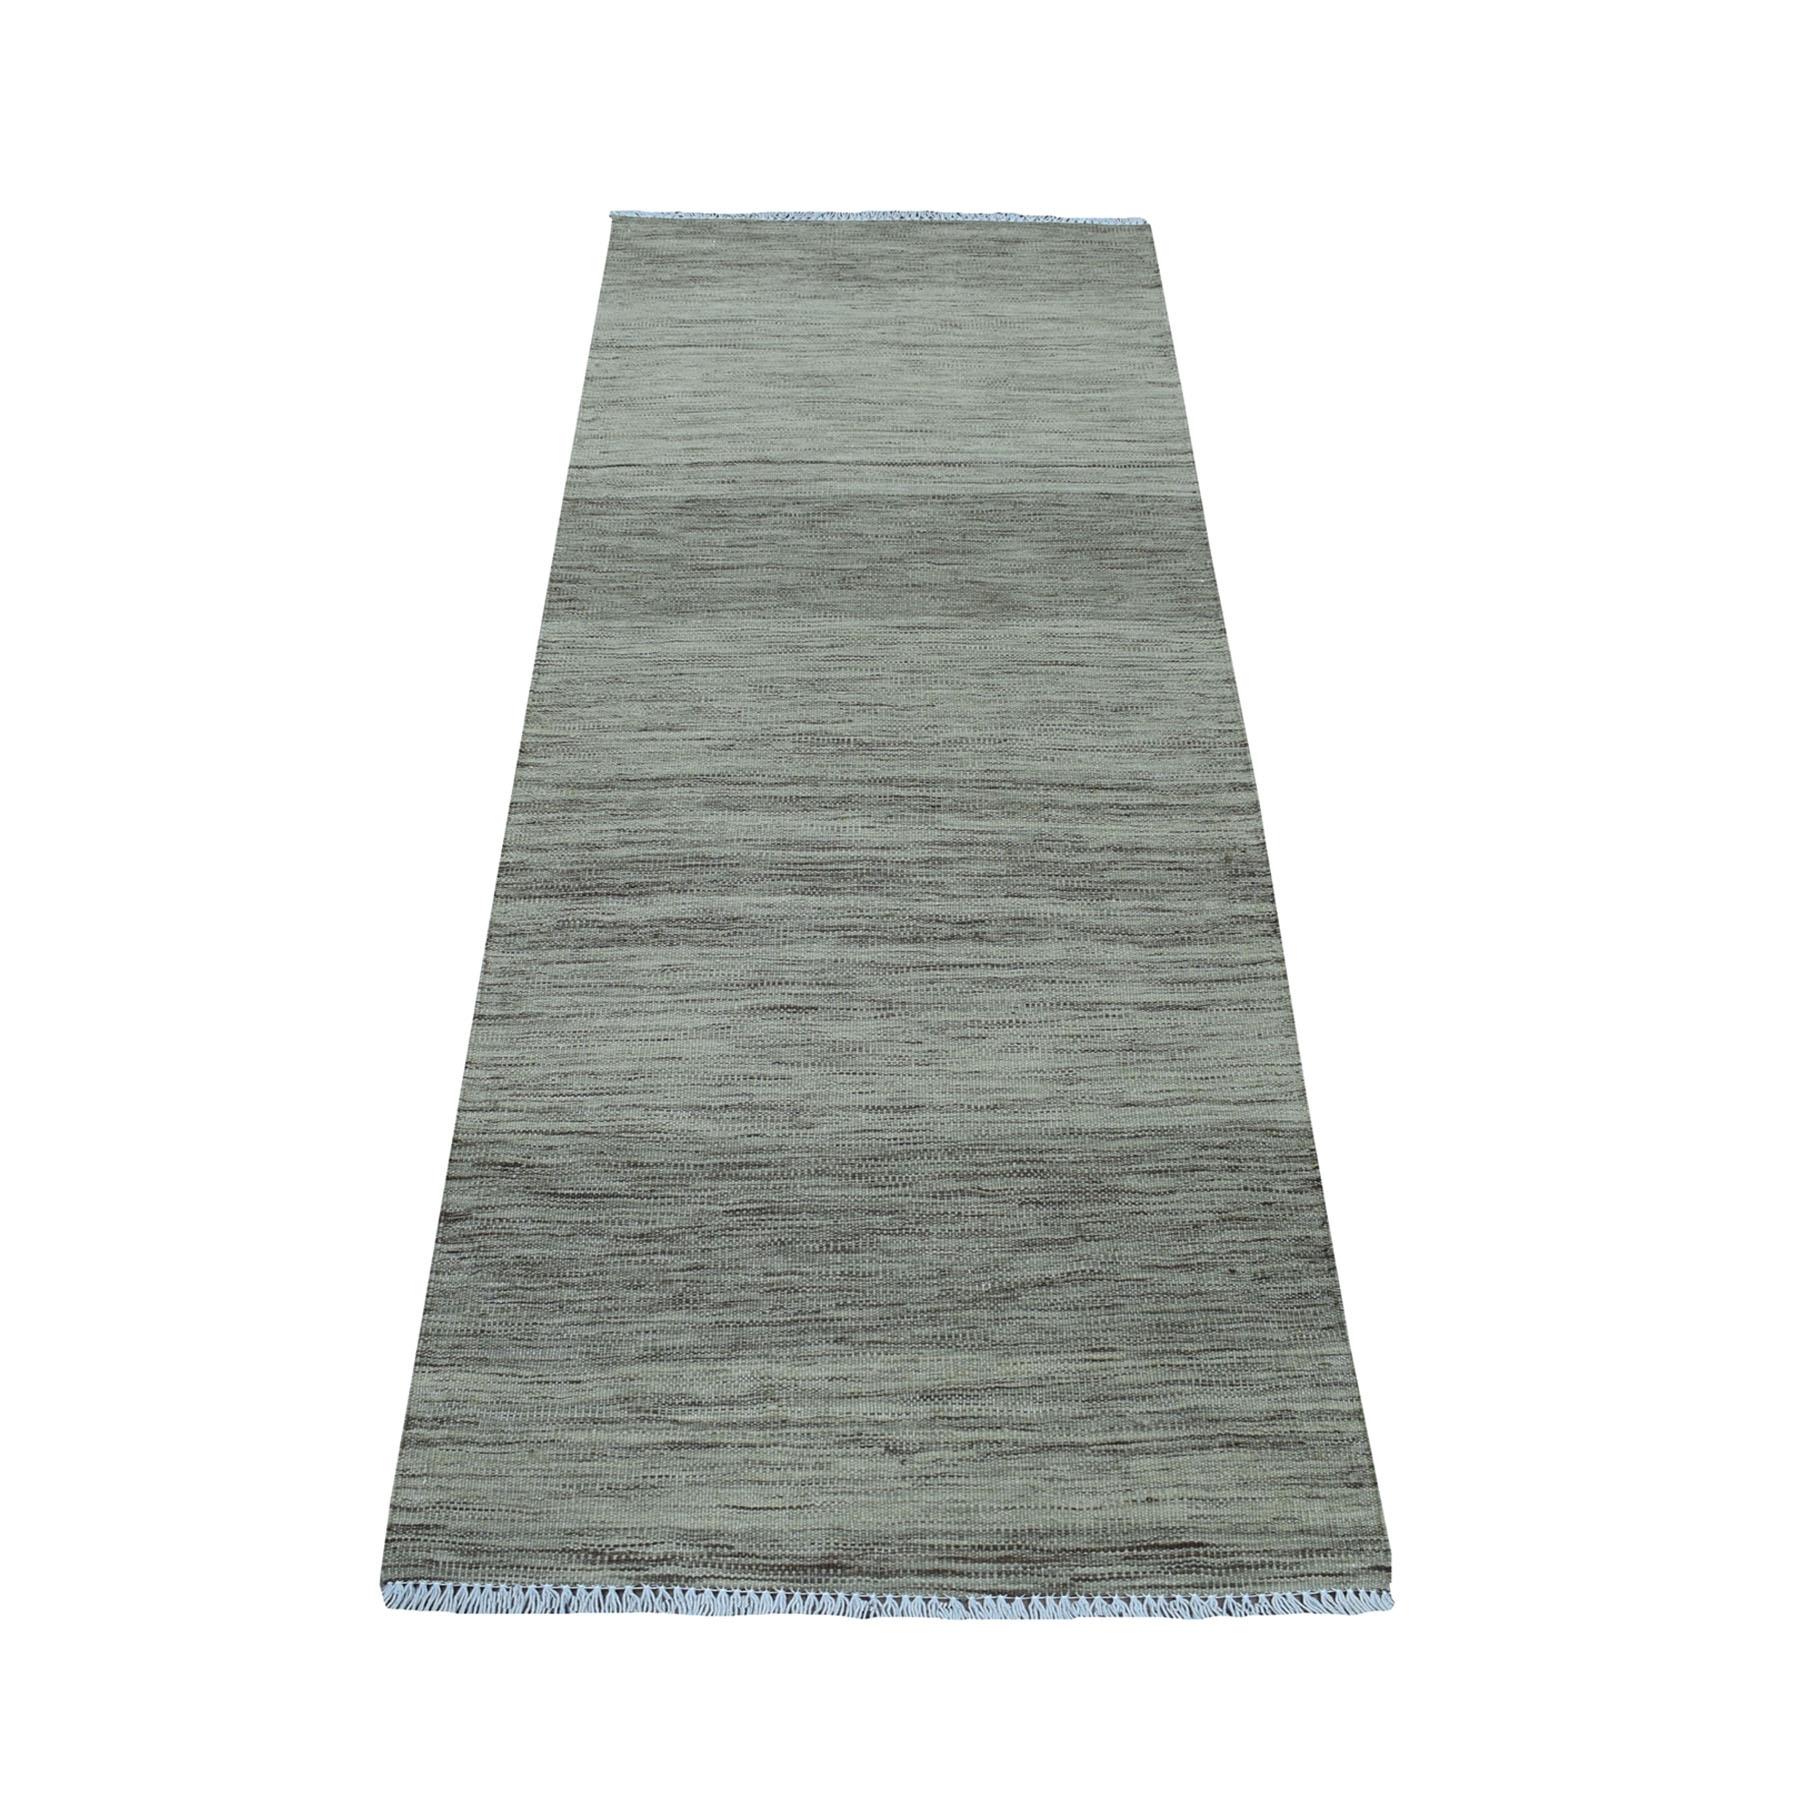 "2'4""X6'4"" Natural Shades Reversible Kilim Pure Wool Hand Woven Runner Oriental Rug moaec8e6"